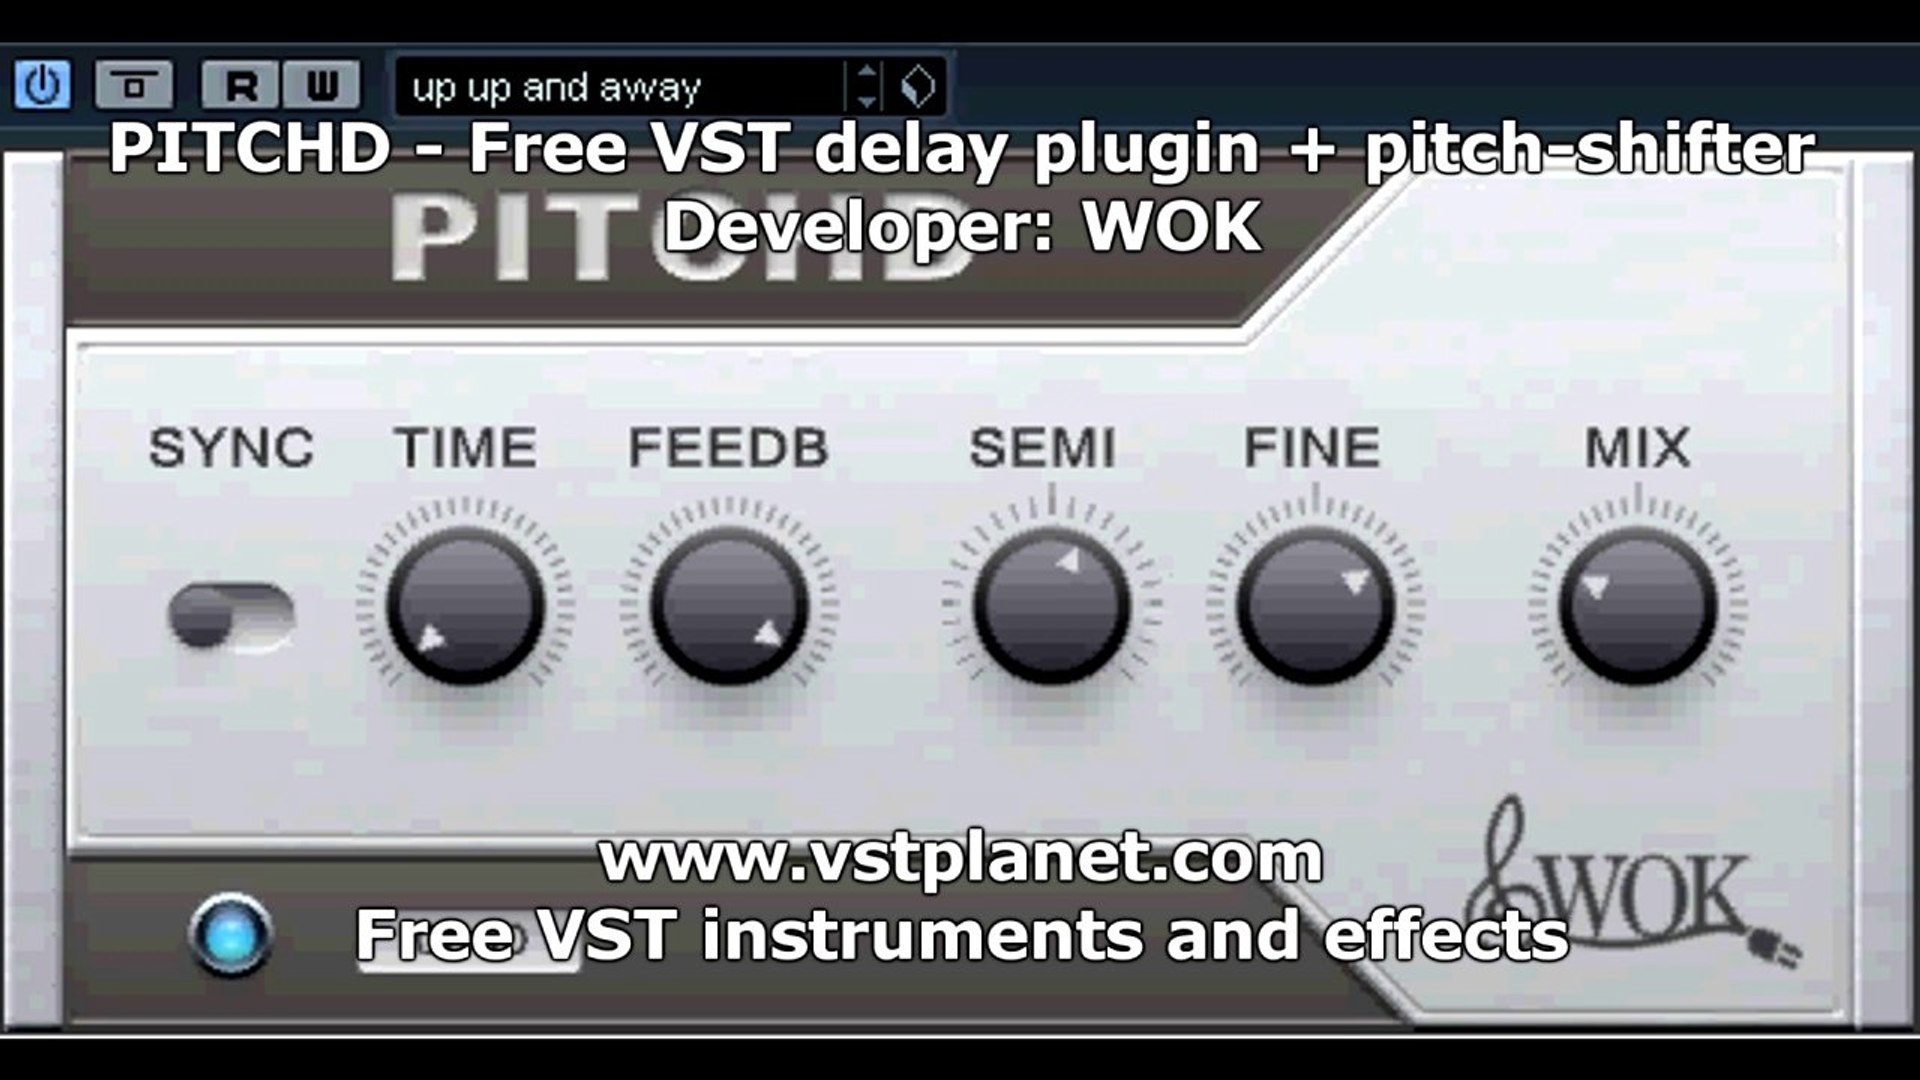 PITCHD - Free VST delay plugin + pitch-shifter - vstplanet com